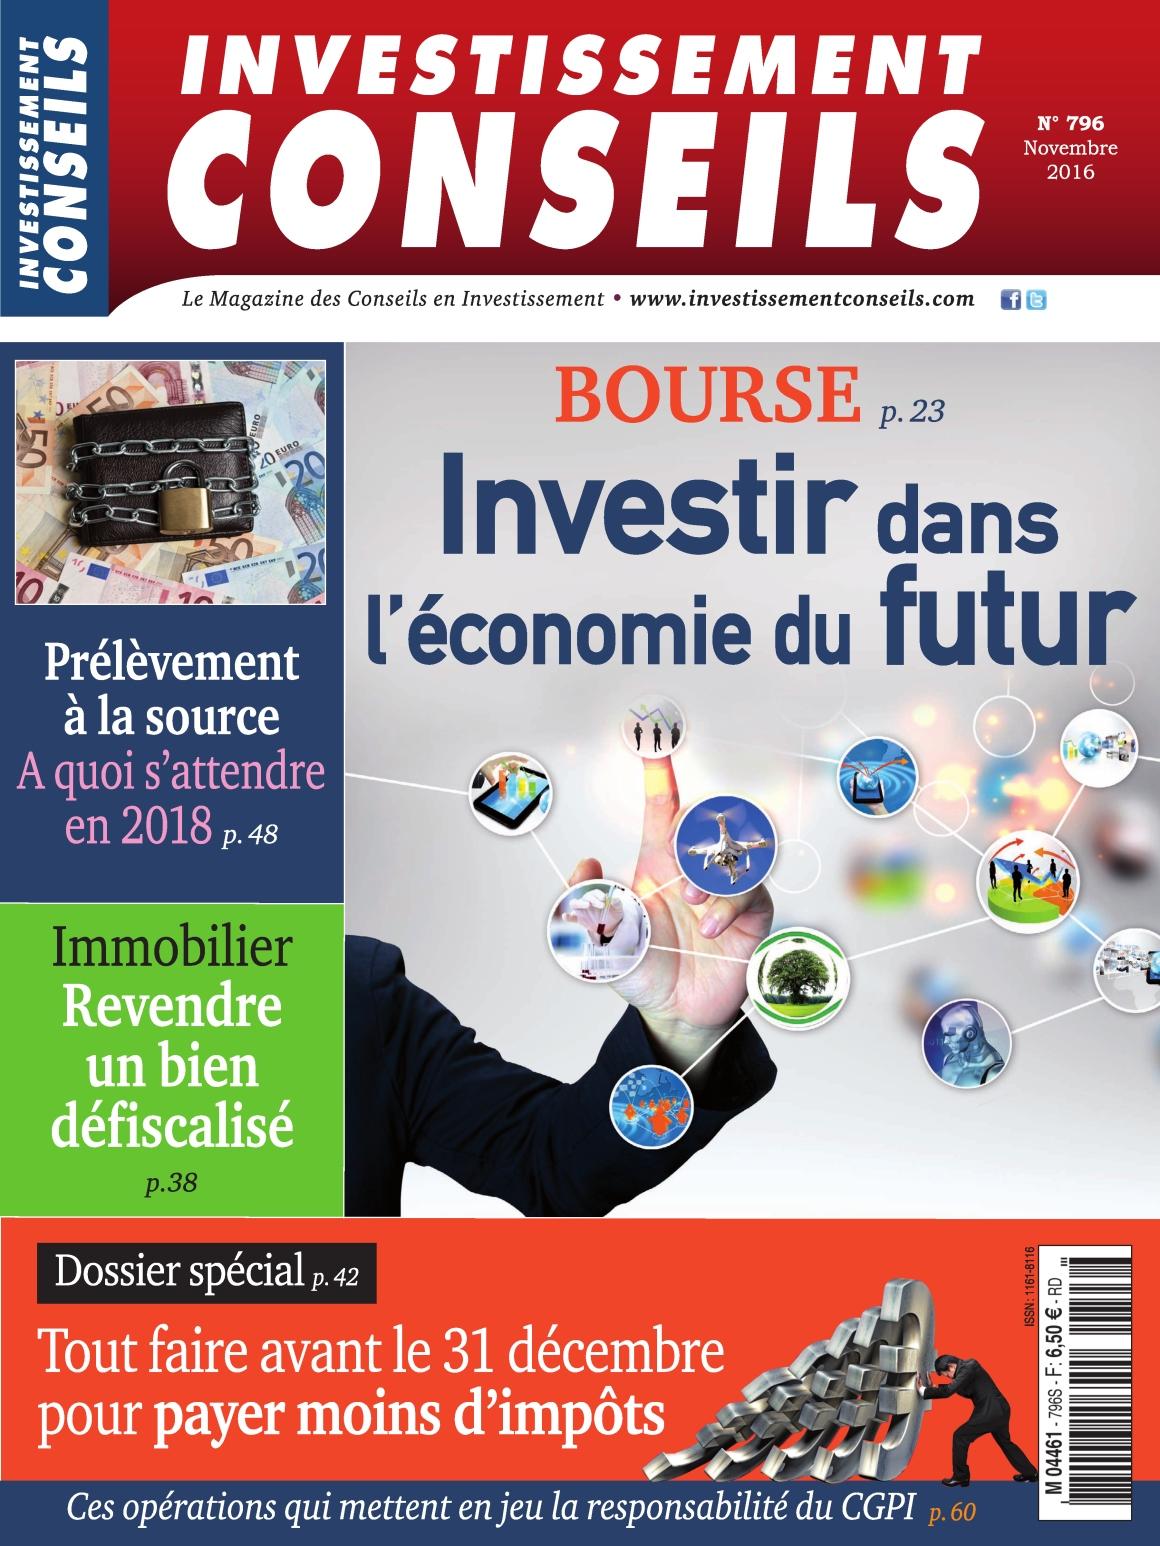 Investissement Conseils N�796 - Novembre 2016